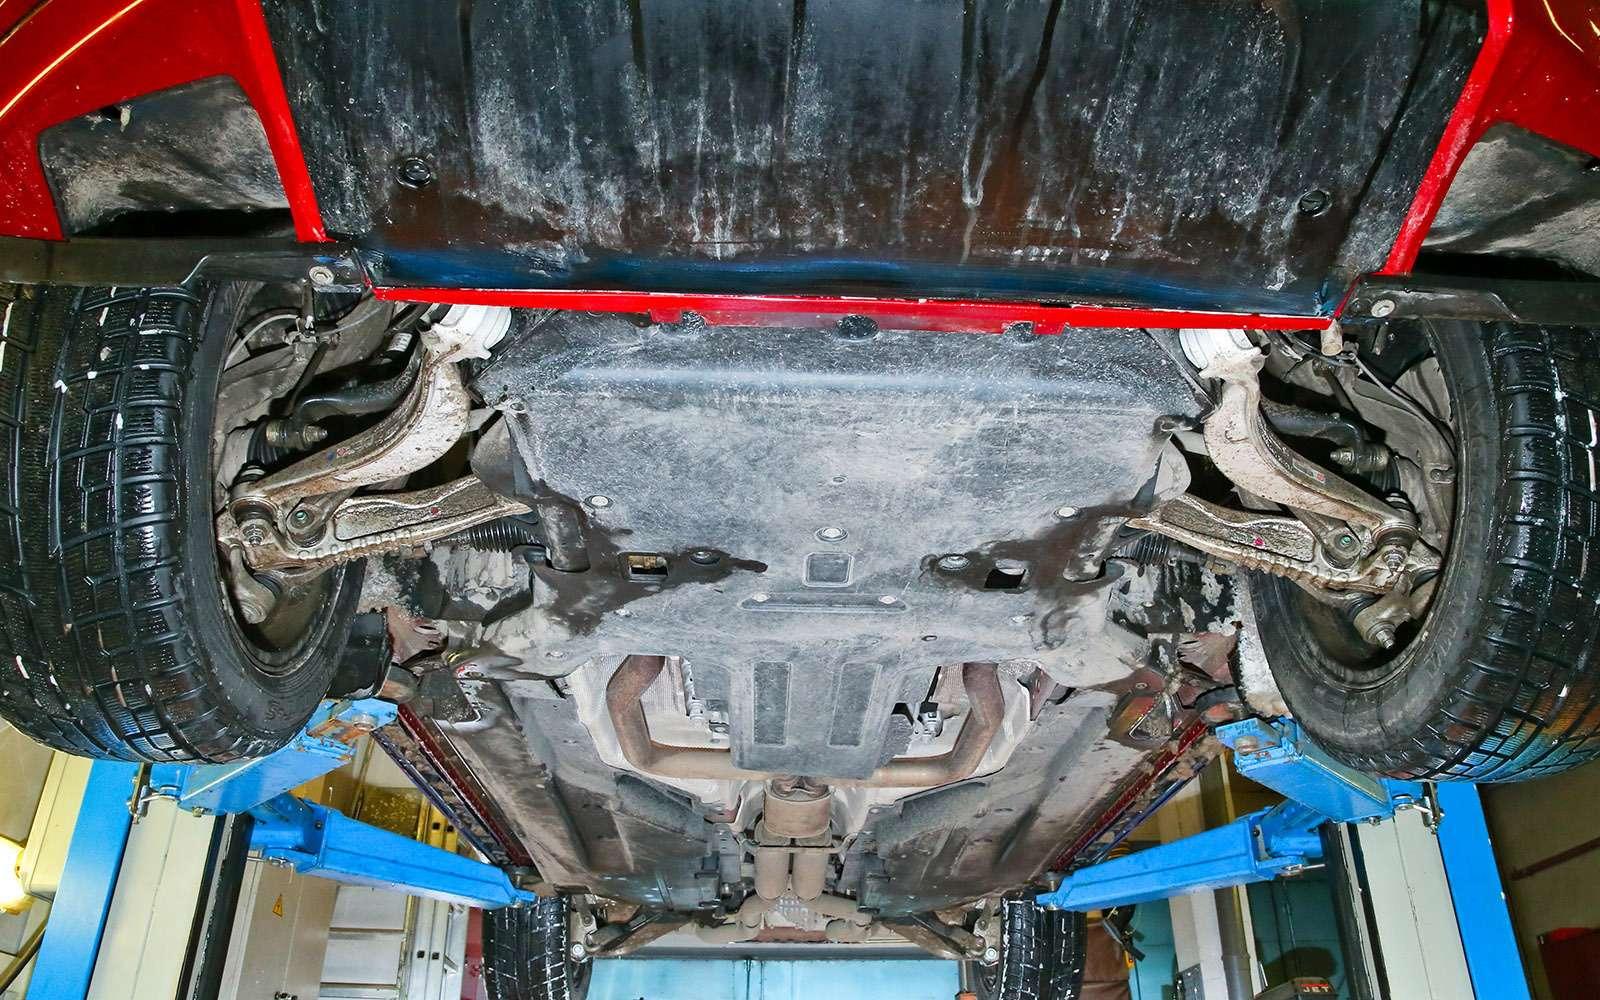 Тест премиум-кроссоверов: Lexus RX350, Cadillac XT5и Jaguar F-Pace— фото 721889